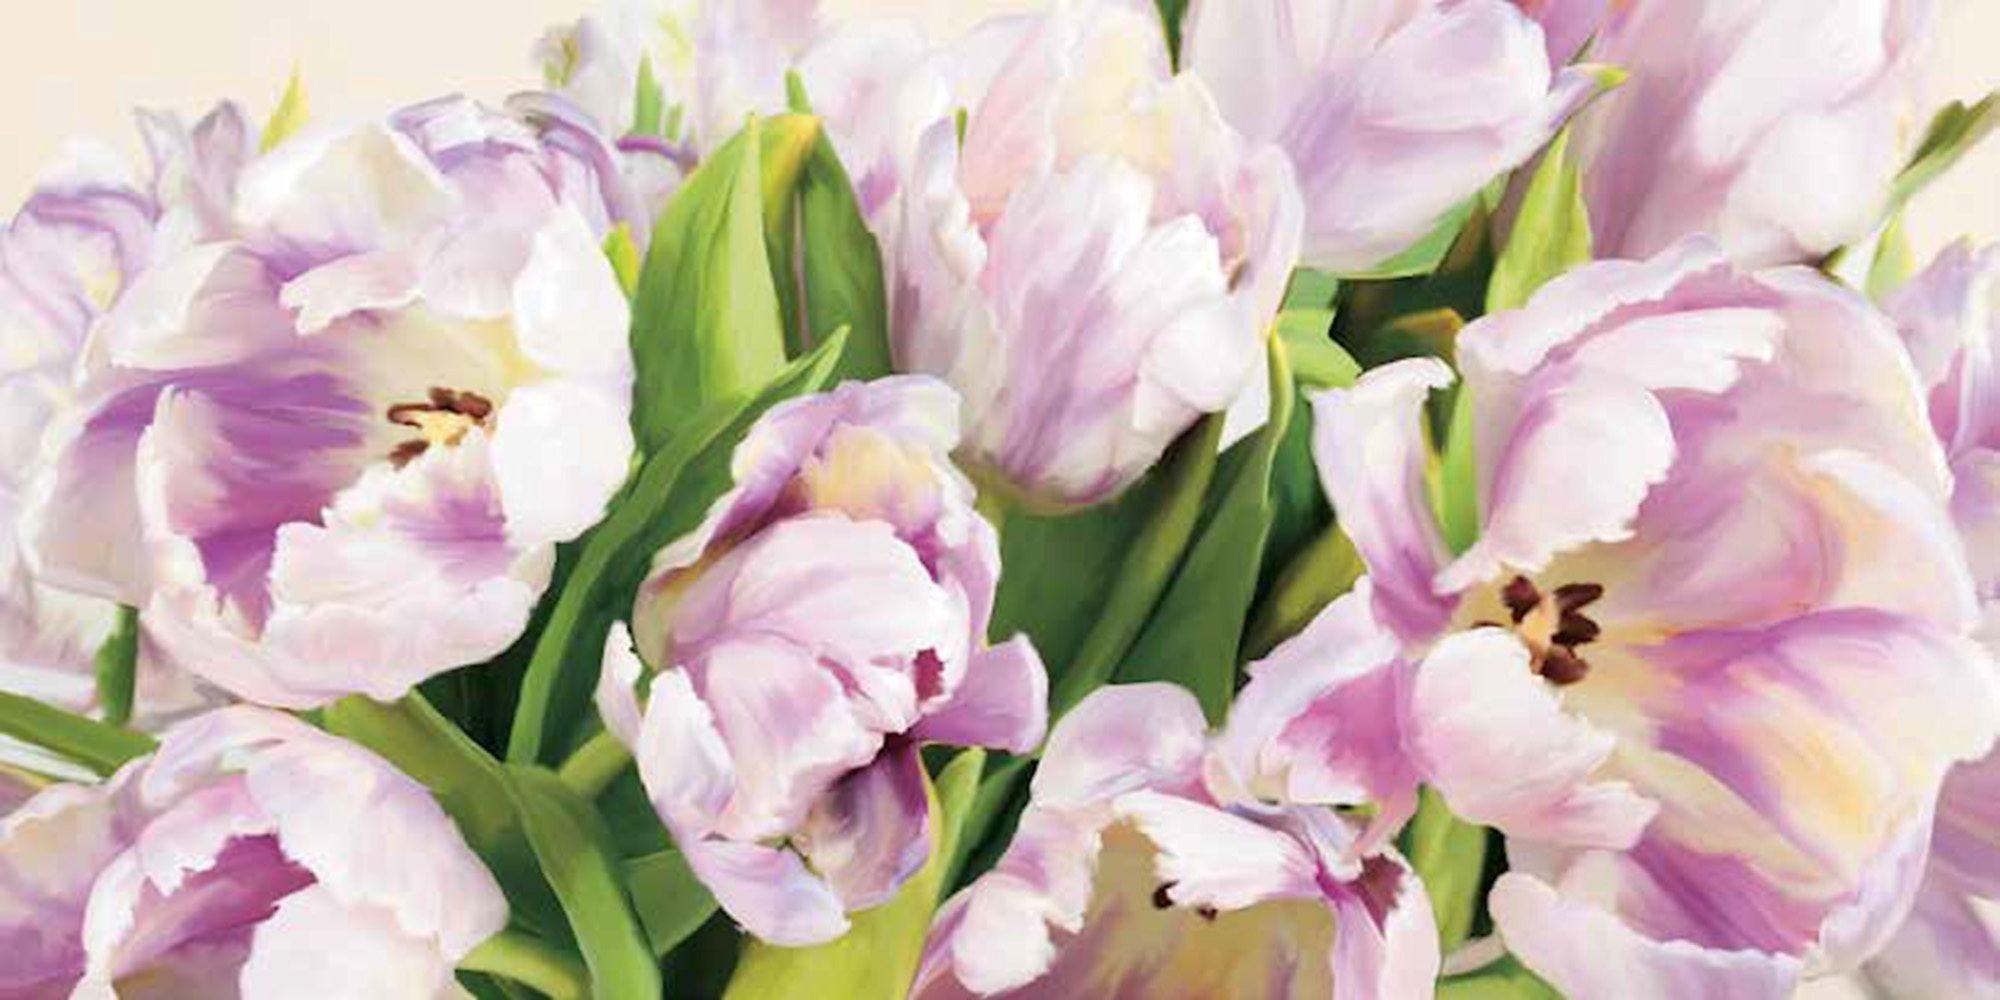 Home Affaire Bild Kunstdruck »Luca Villa, Tulipes en Fleur«, 100/50 cm